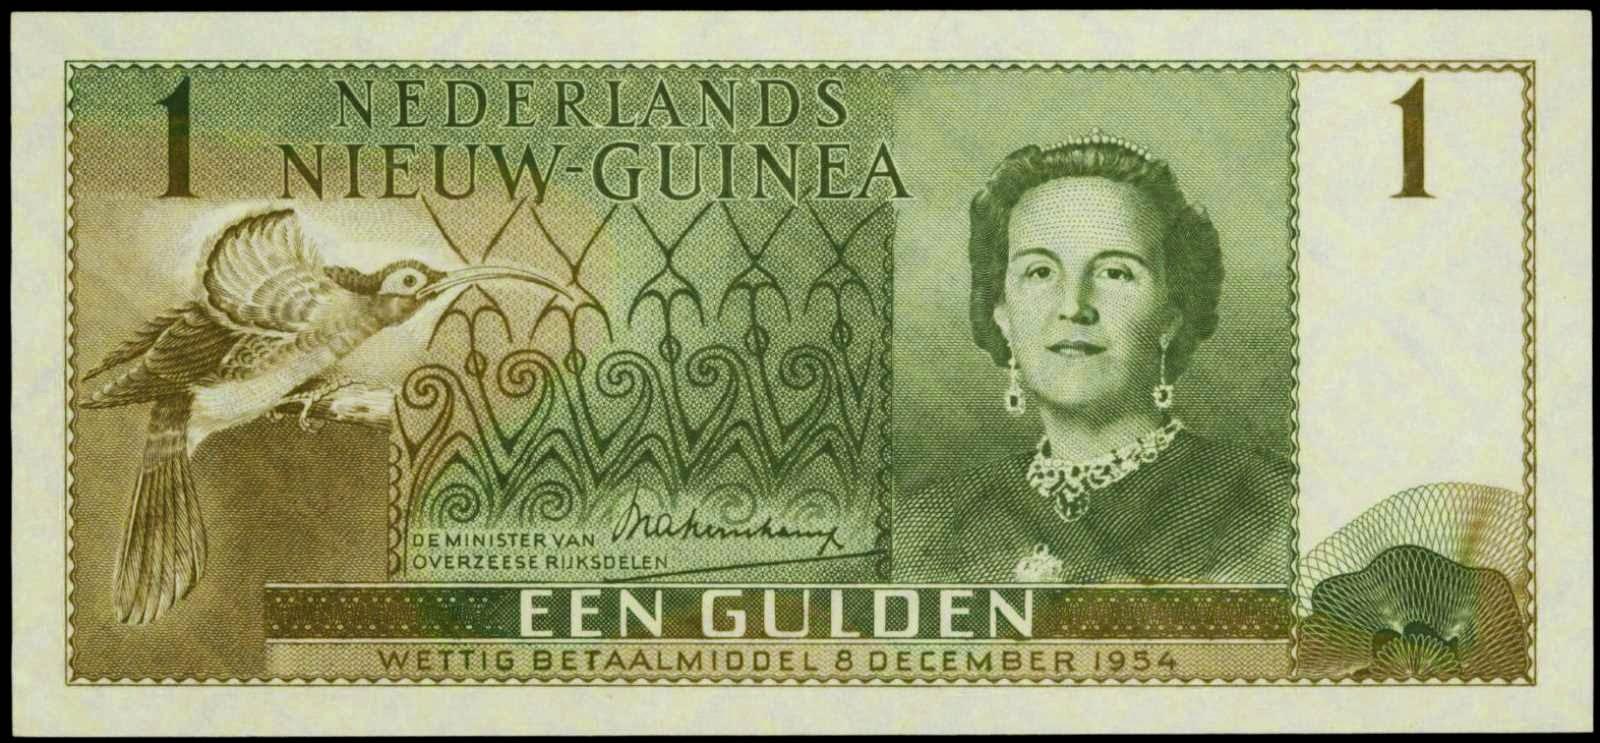 Netherlands New Guinea banknotes 1 Gulden banknote 1954 Queen Juliana